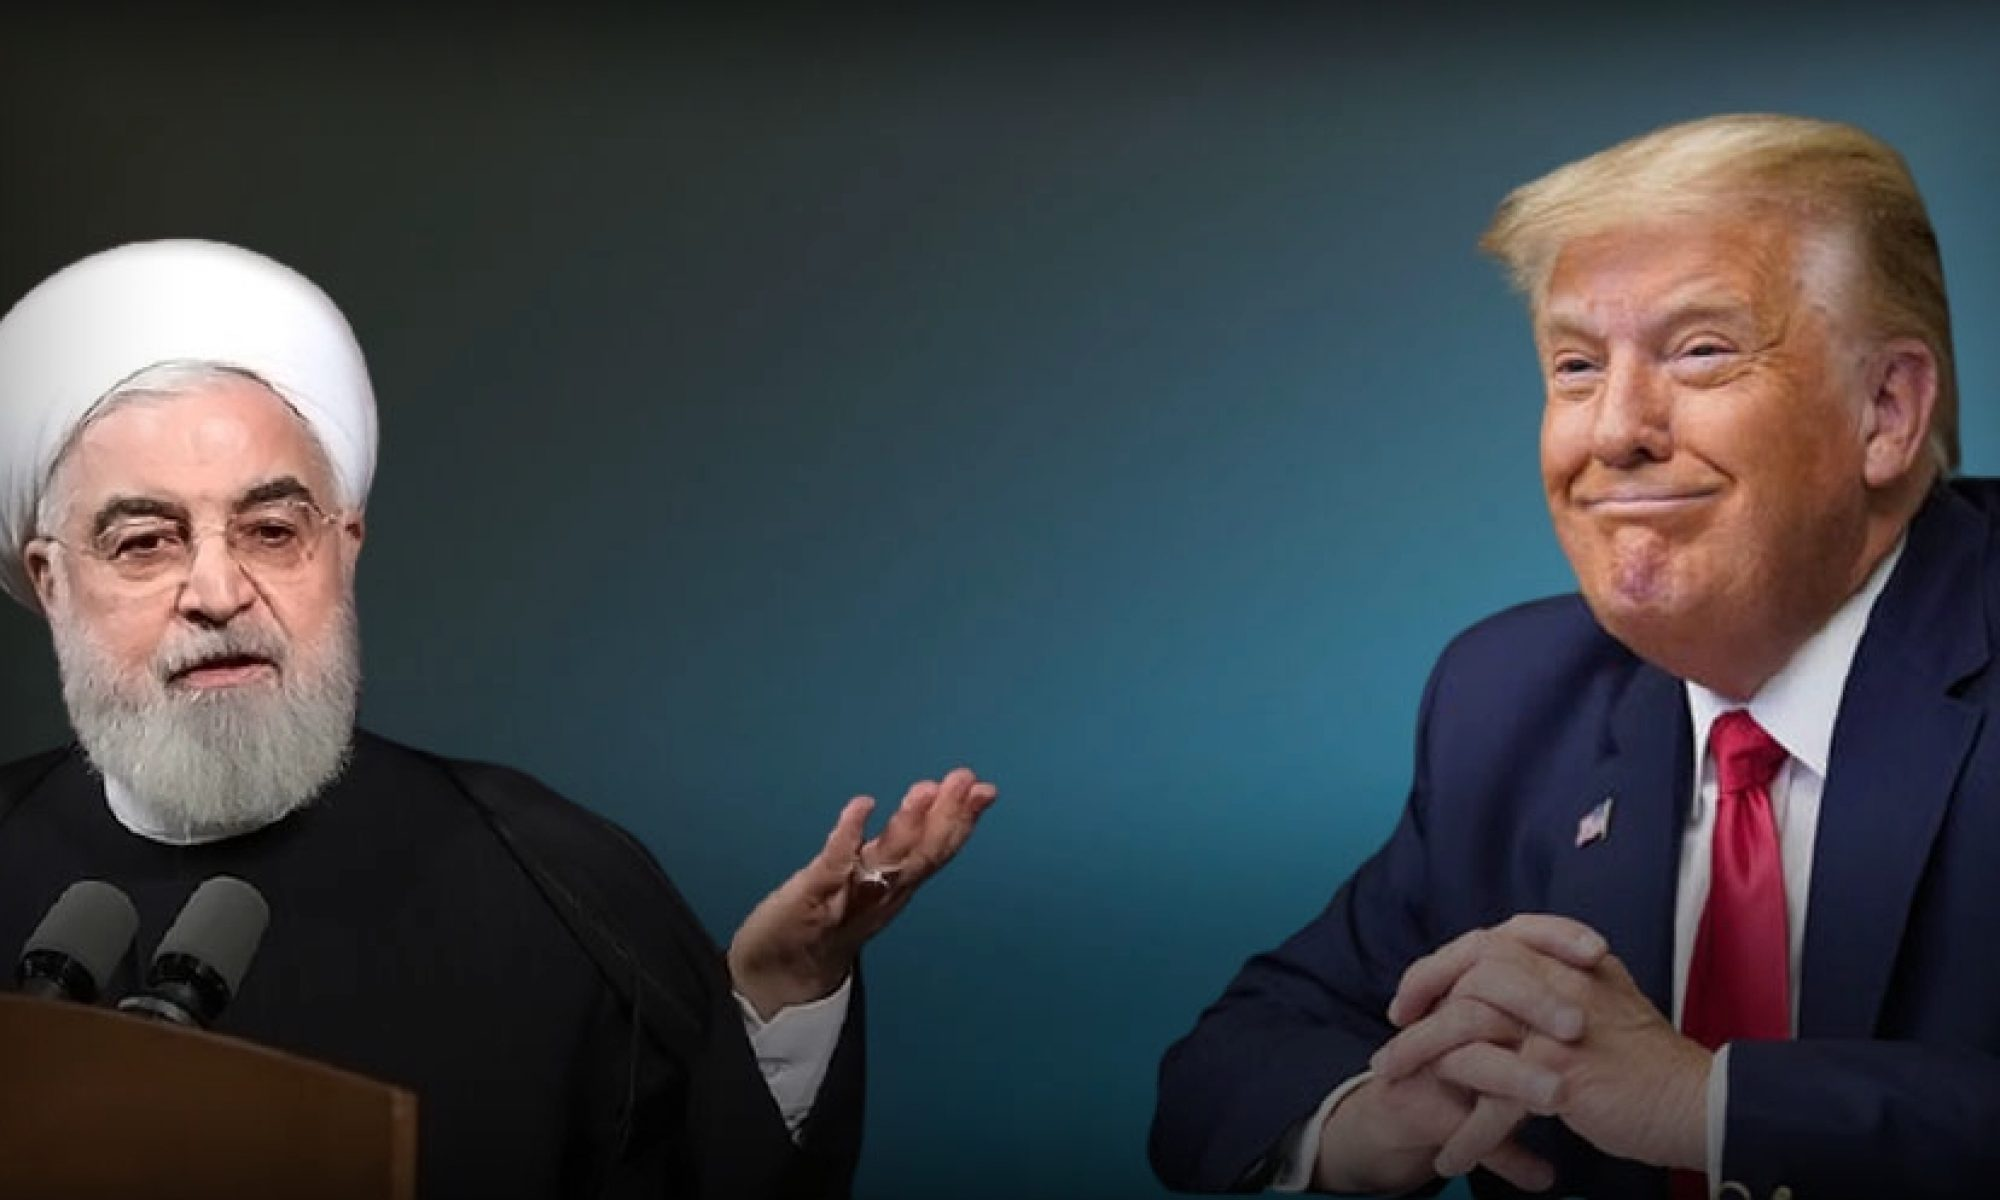 رۆحانی، ترامپ ب «تهرۆریستێ مێژوویی» ناڤ دكهت